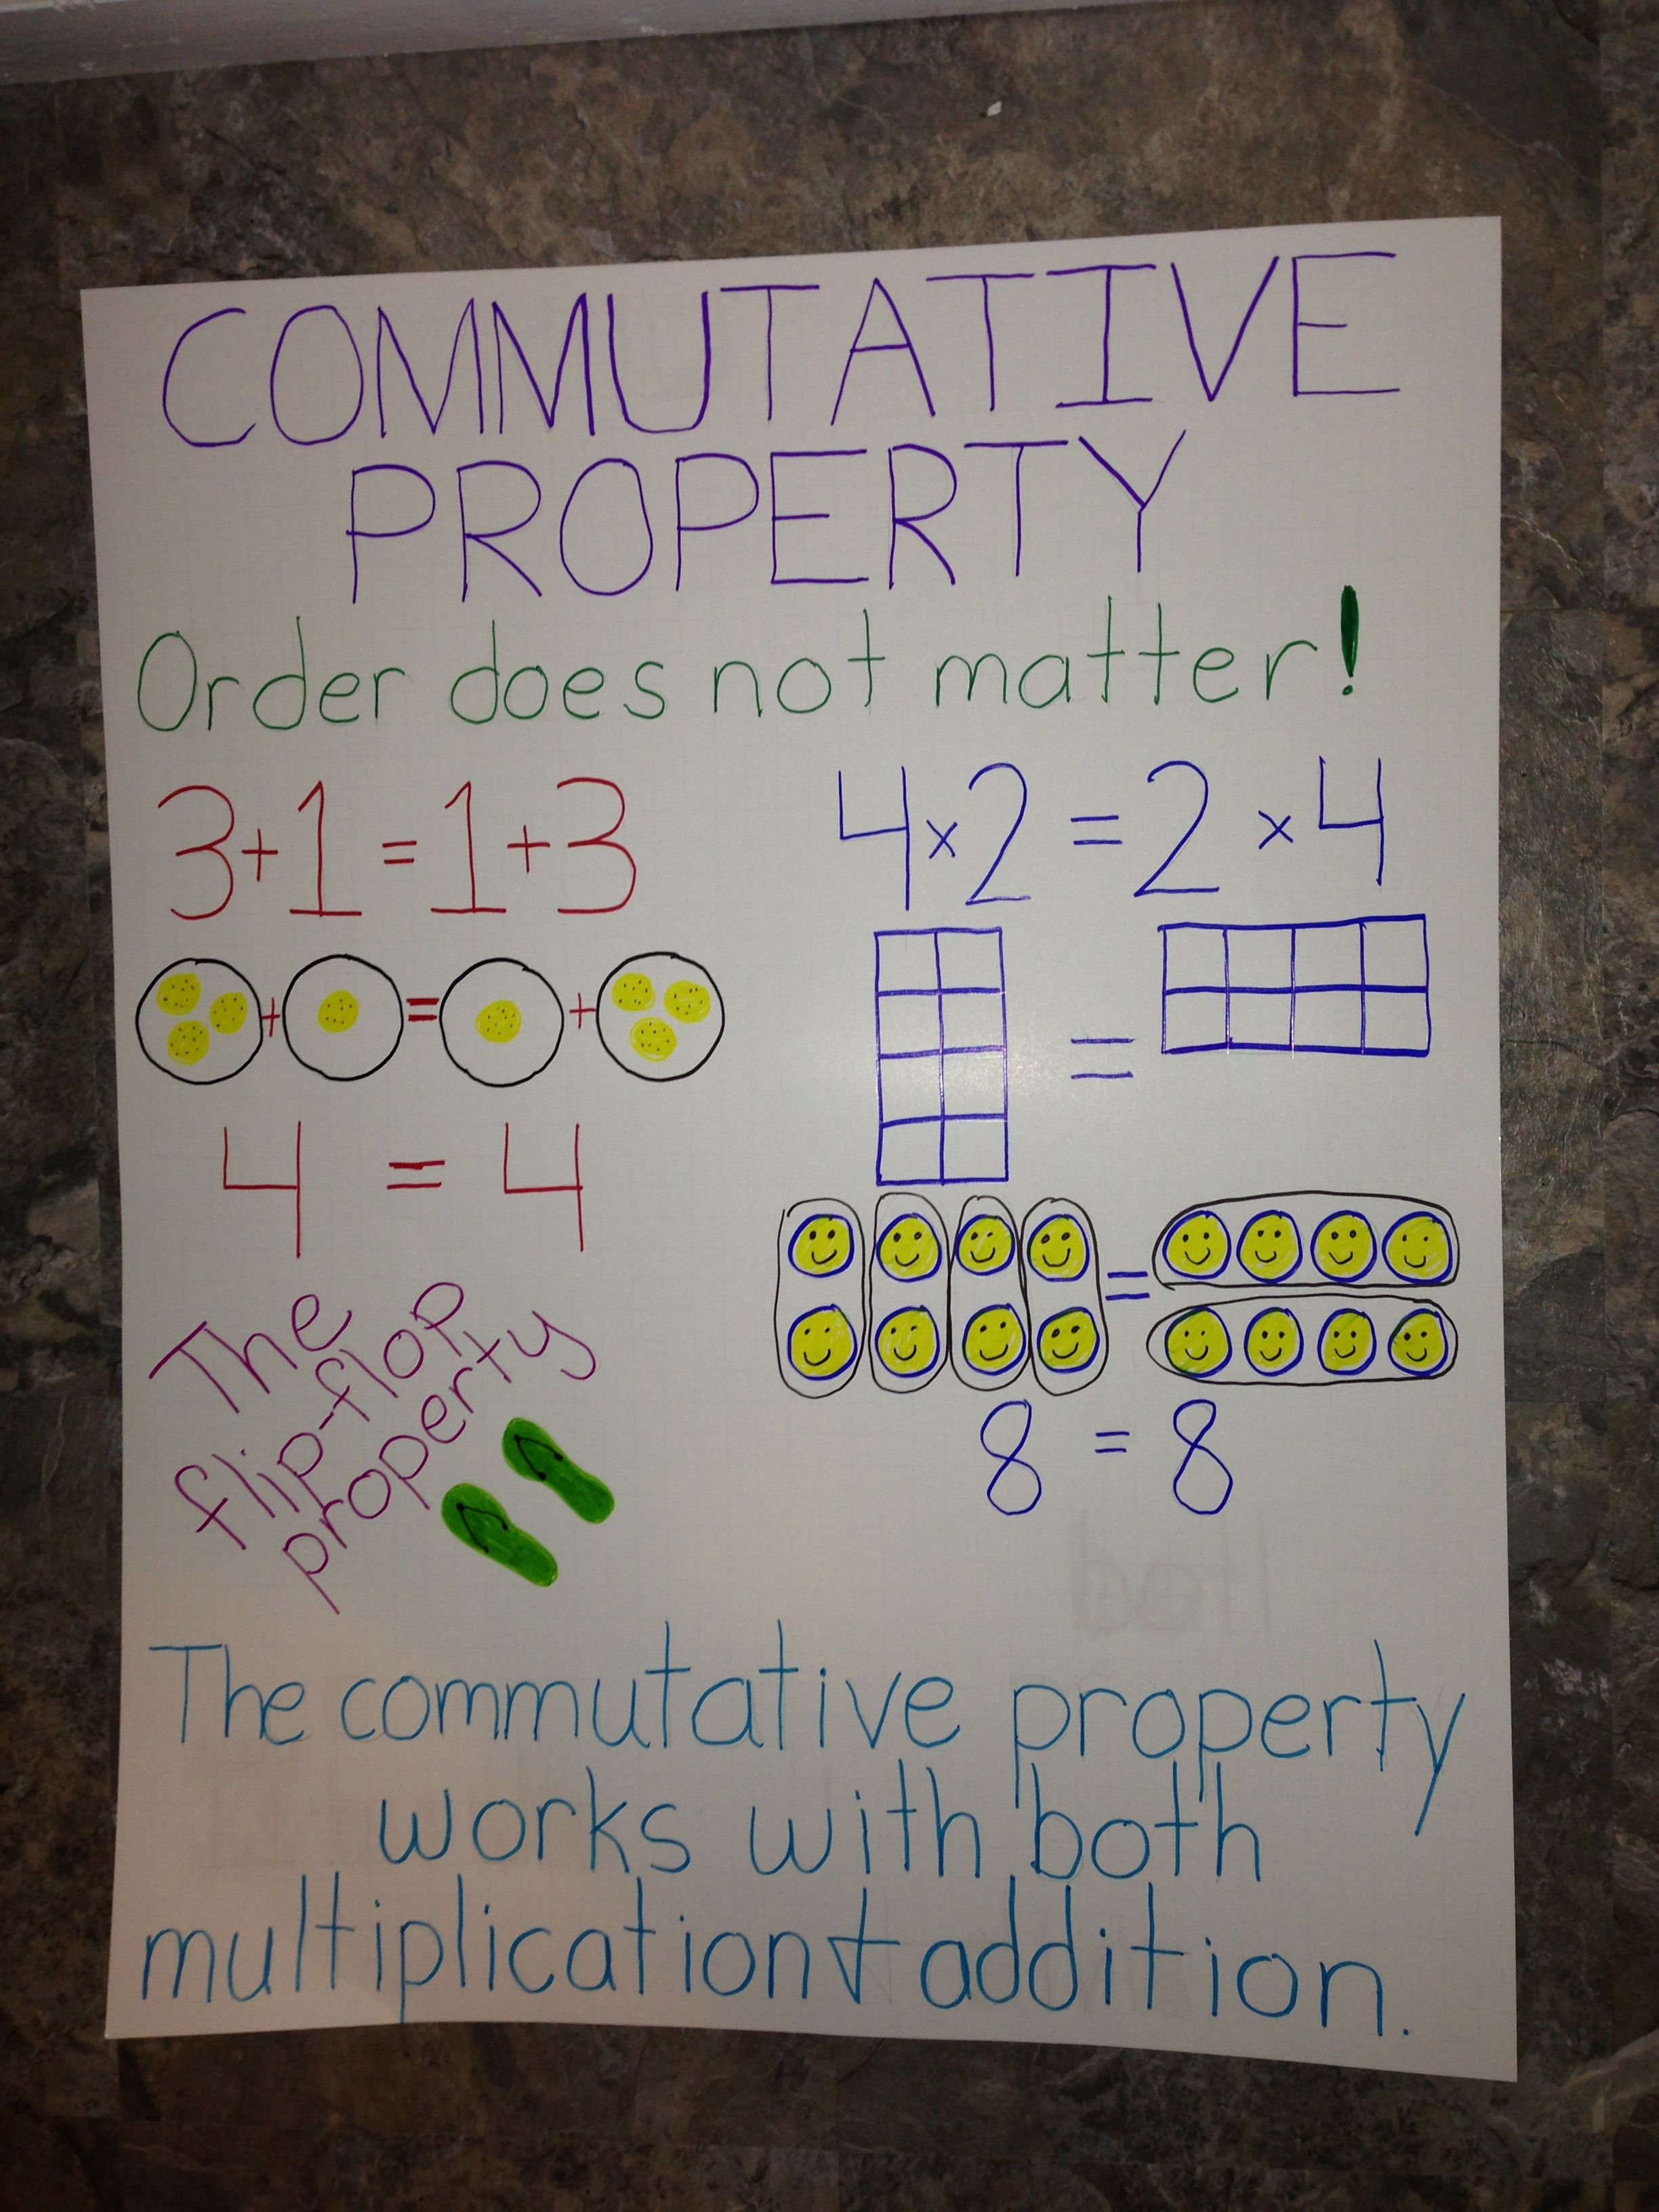 Commutative Property Anchor Chart Properties Commutative Property Math Properties Anchor Charts Commutative property of addition and